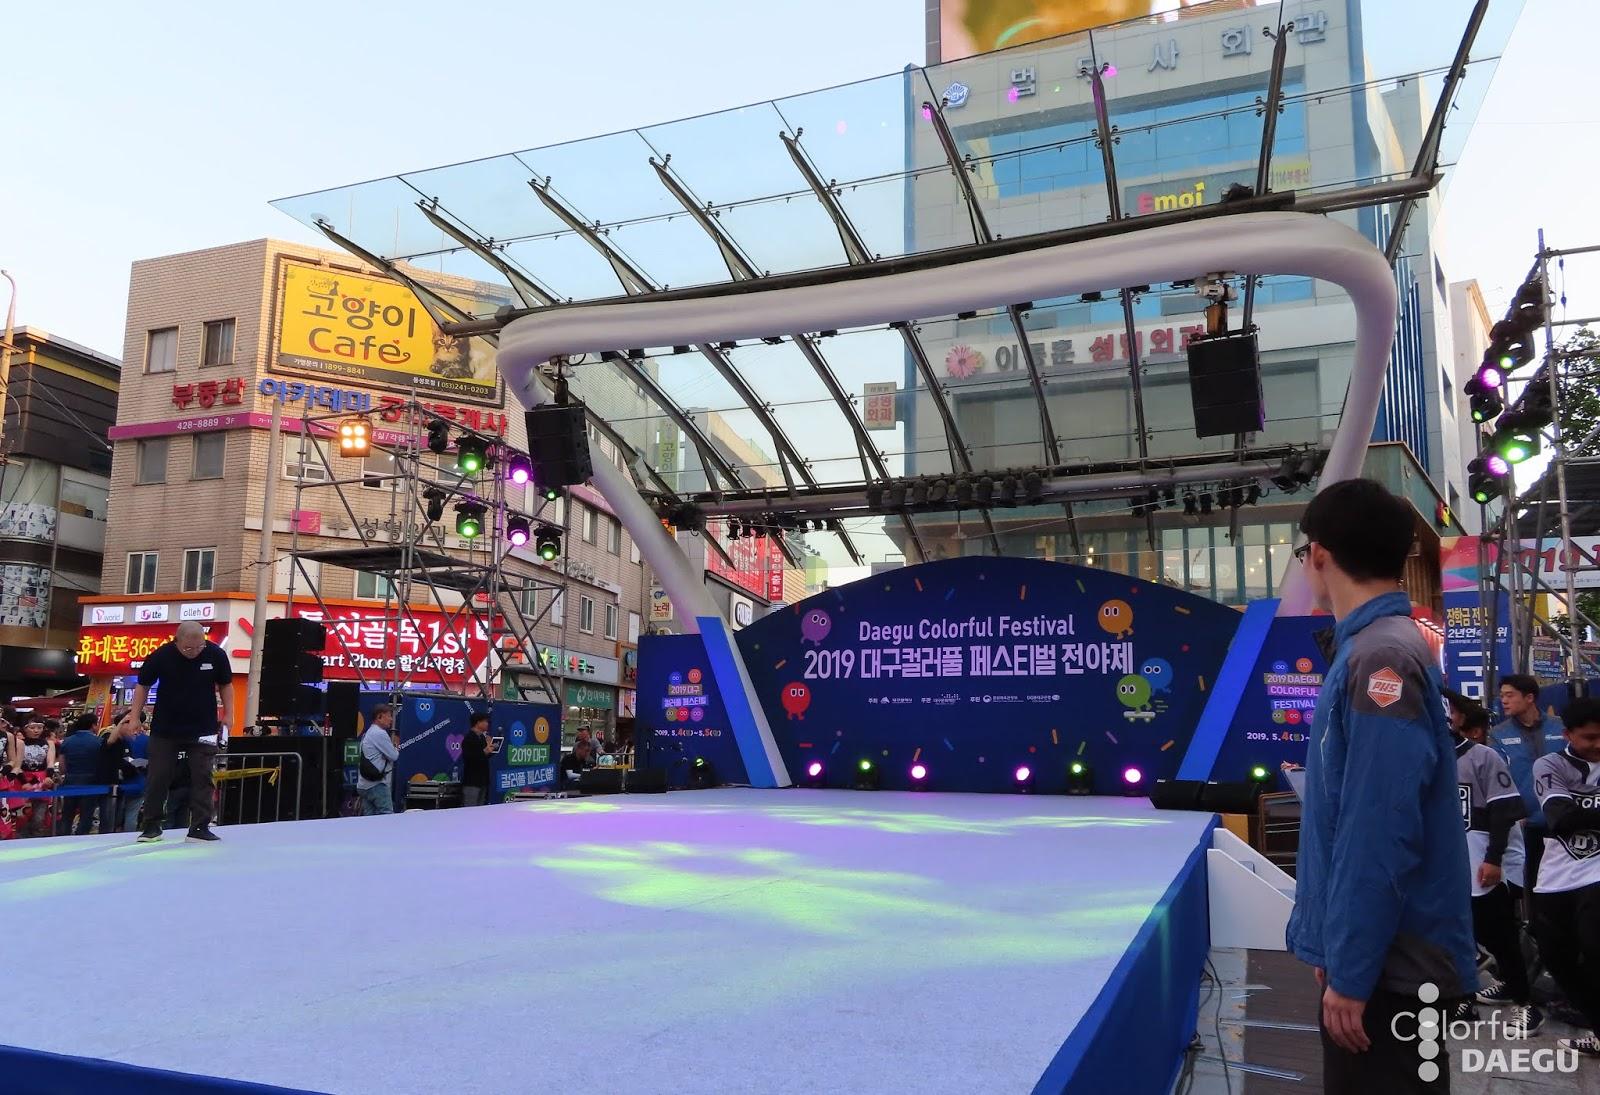 Memories of 2019 Daegu Colourful Festival - Event of the Eve